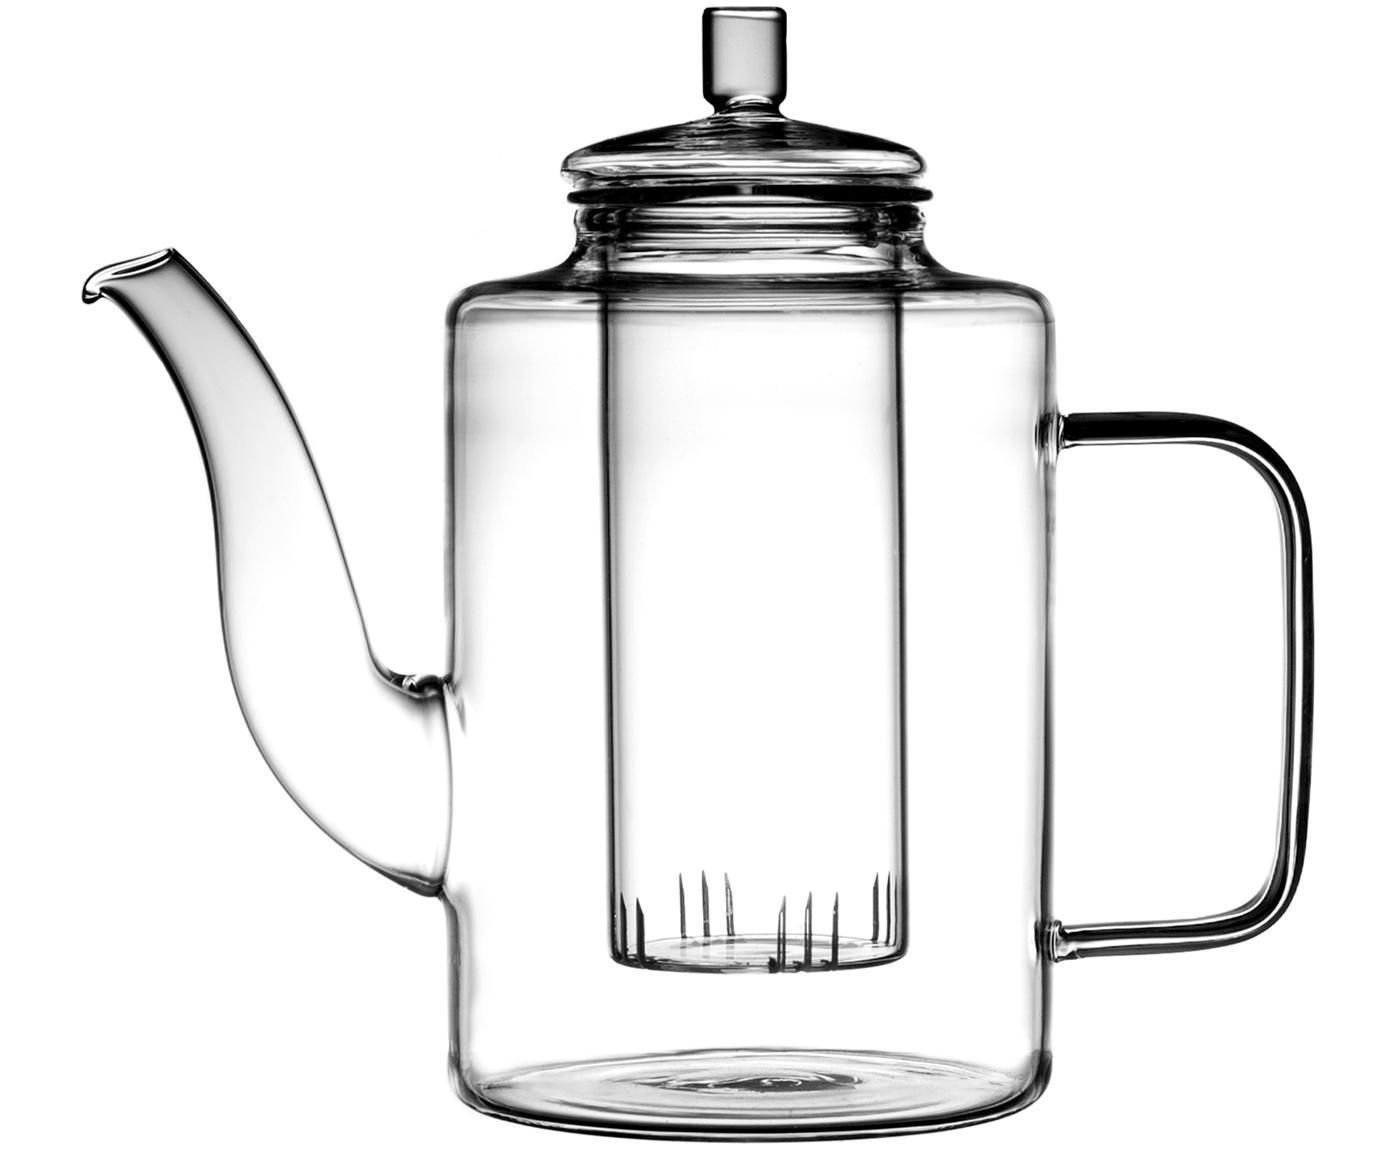 Tetera Drana, Vidrio, Transparente, 900 ml